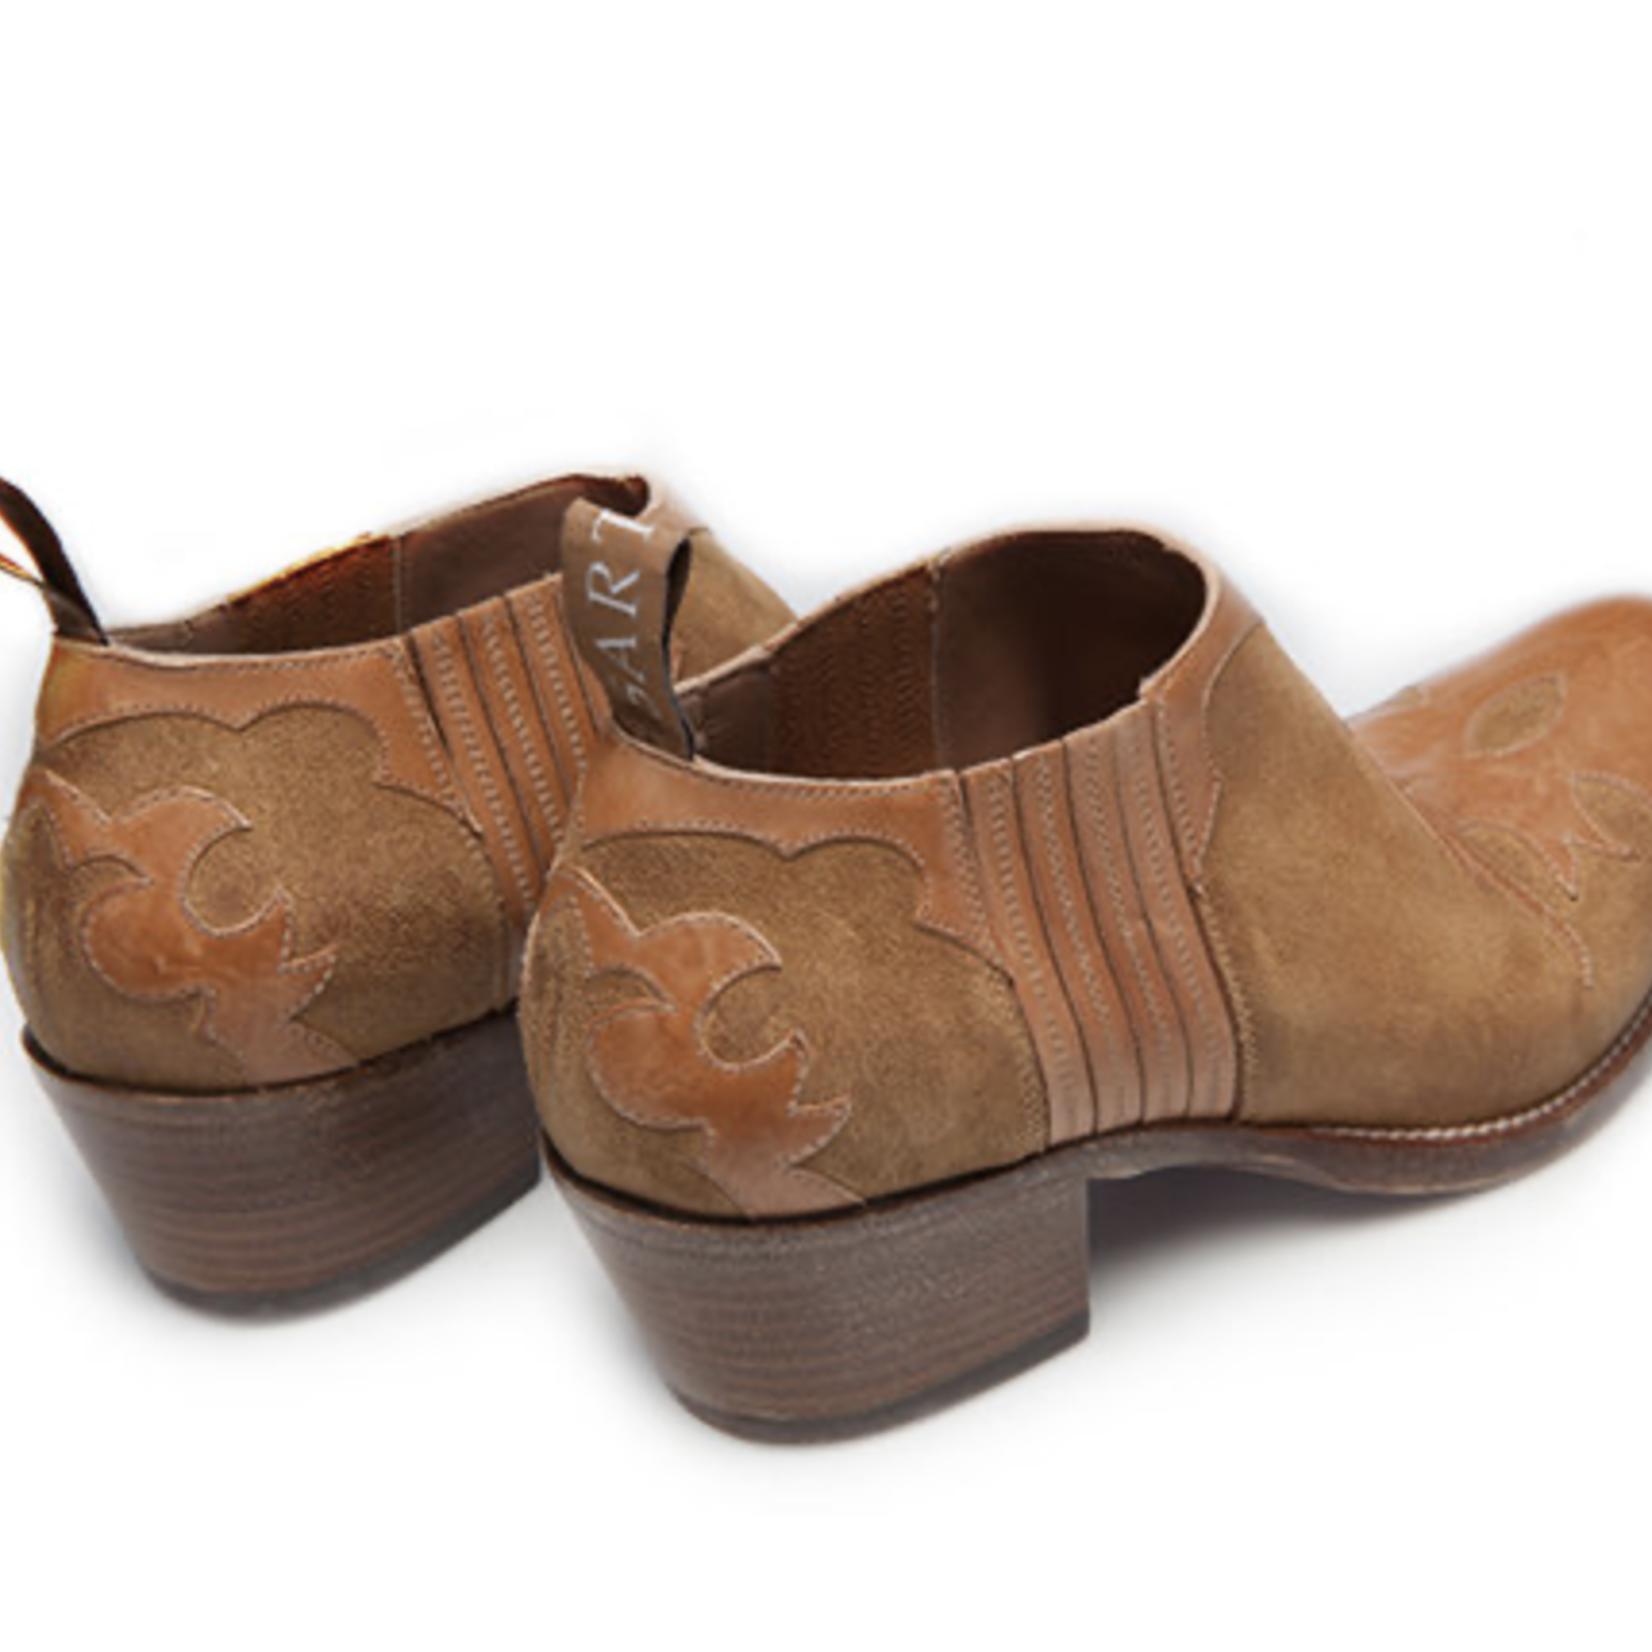 Sartore Western low boot